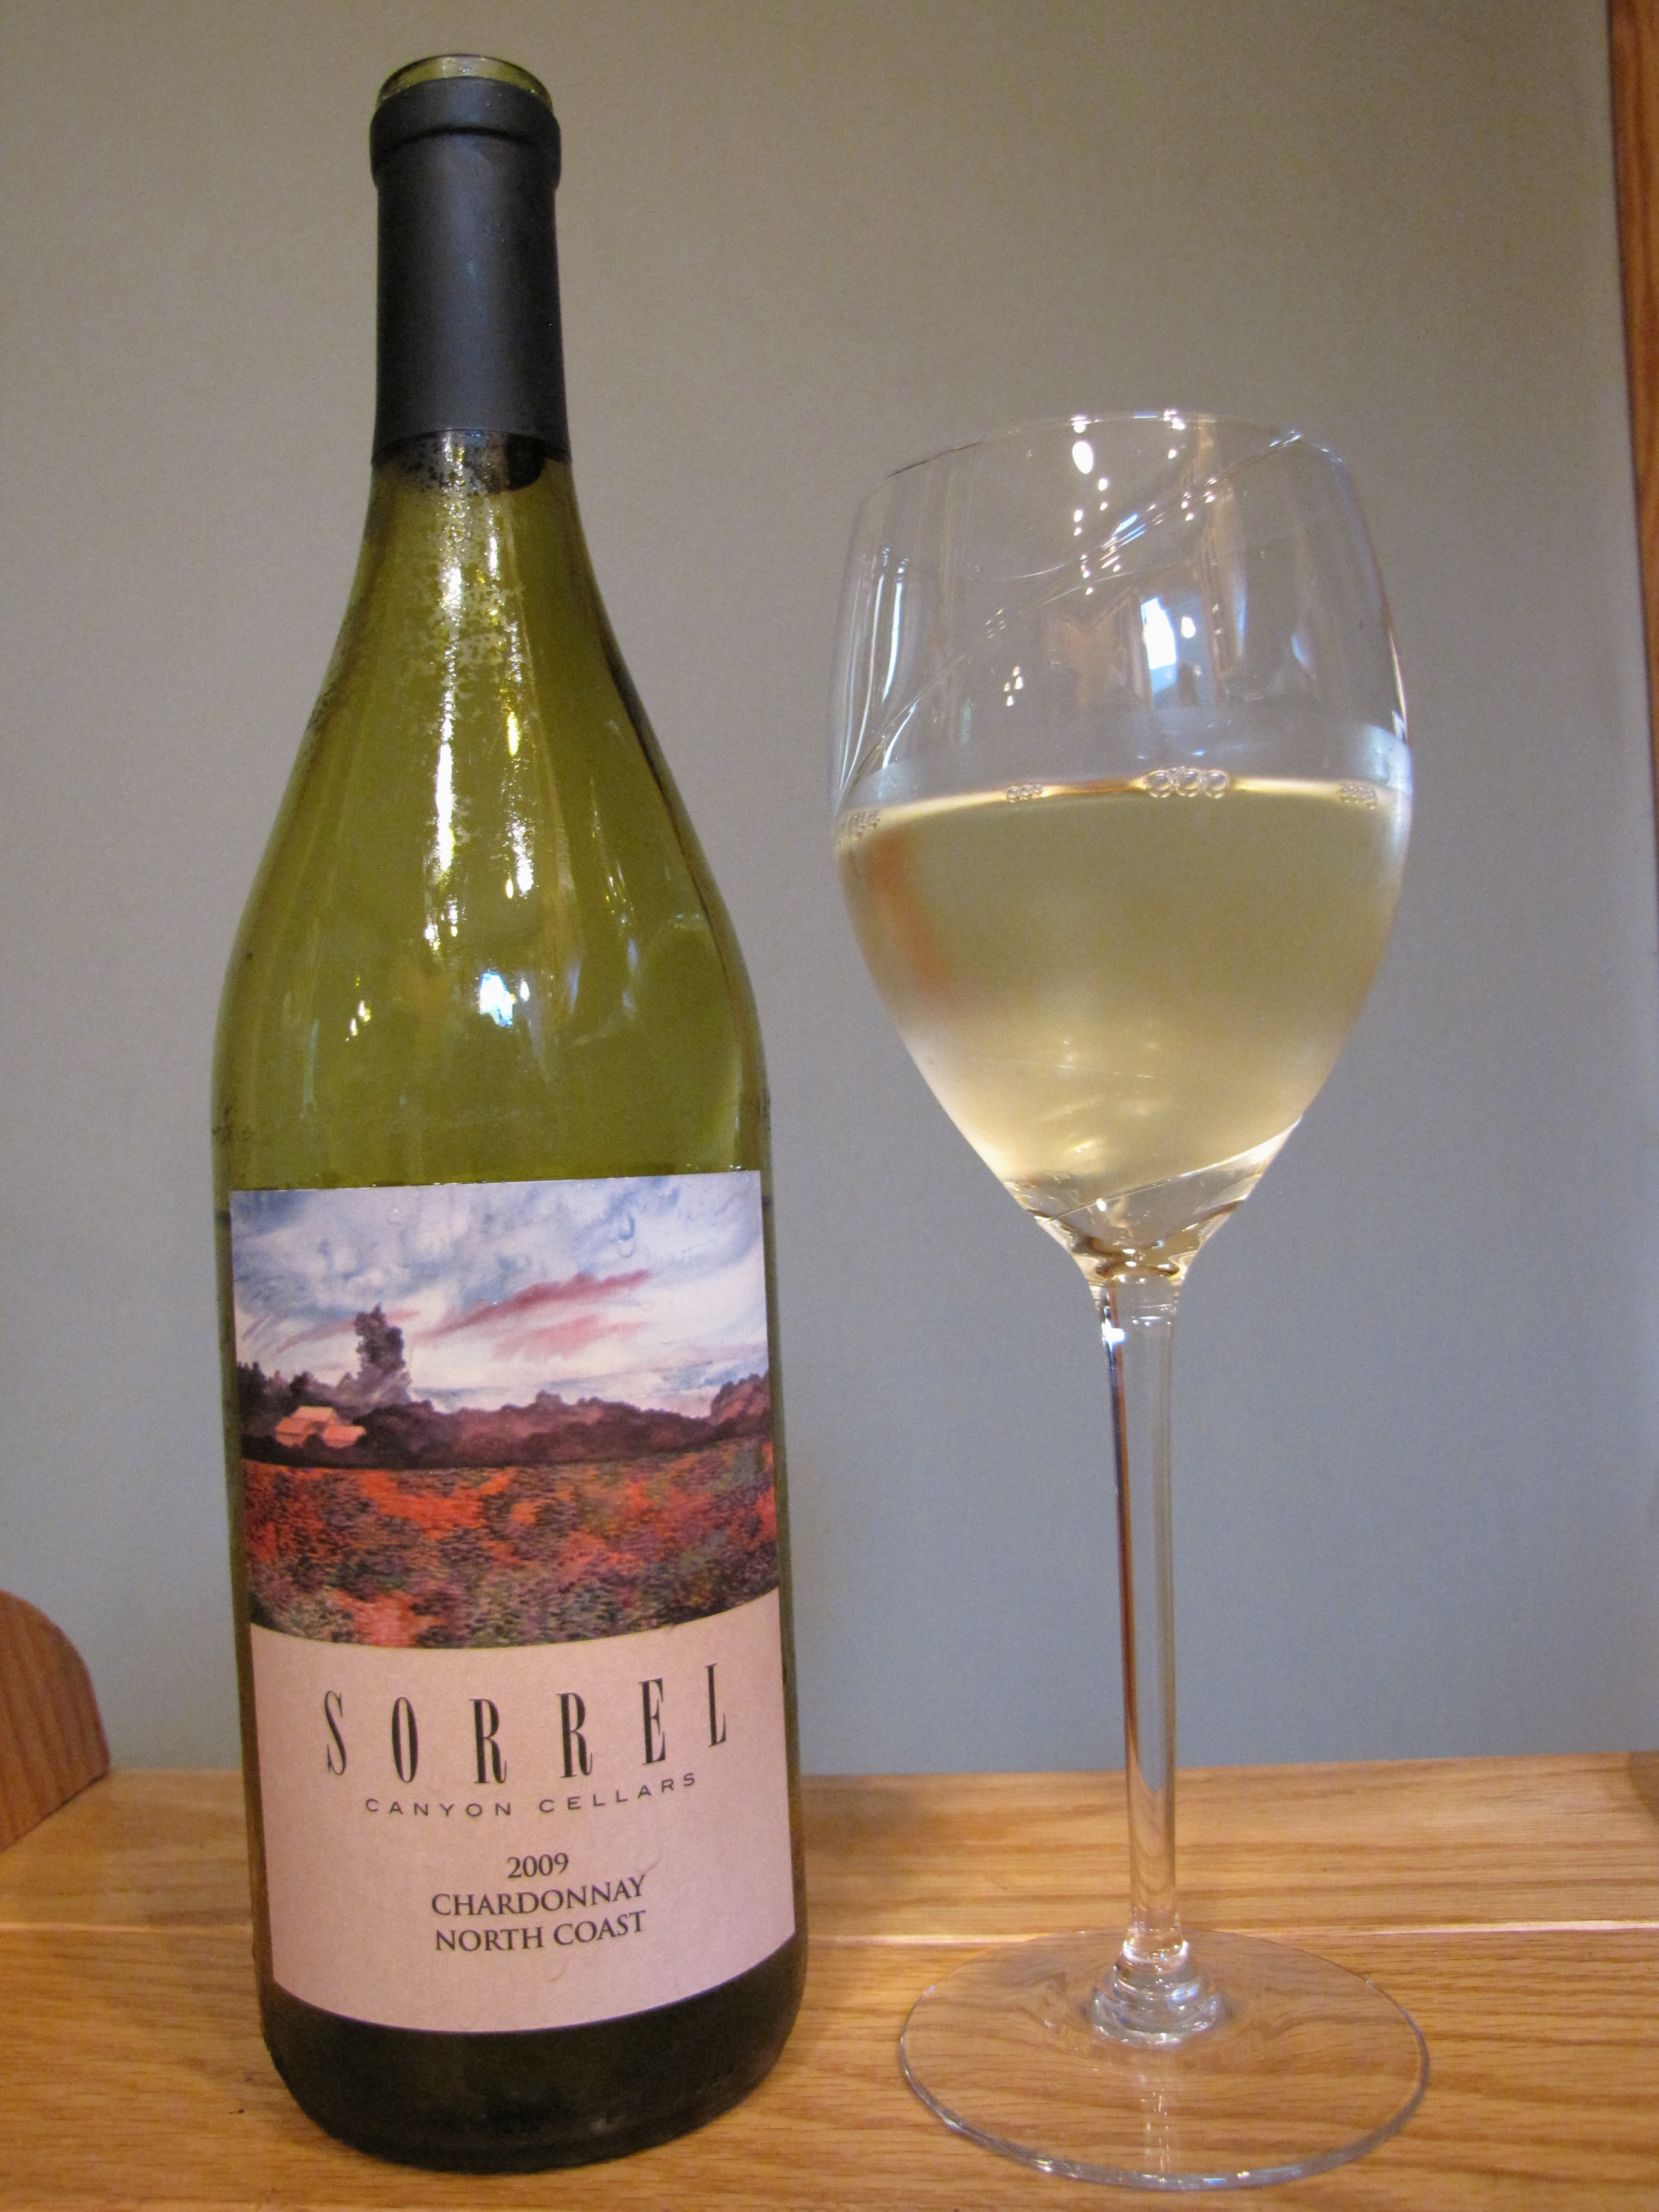 Sorrel Canyon Chardonnay (2009)